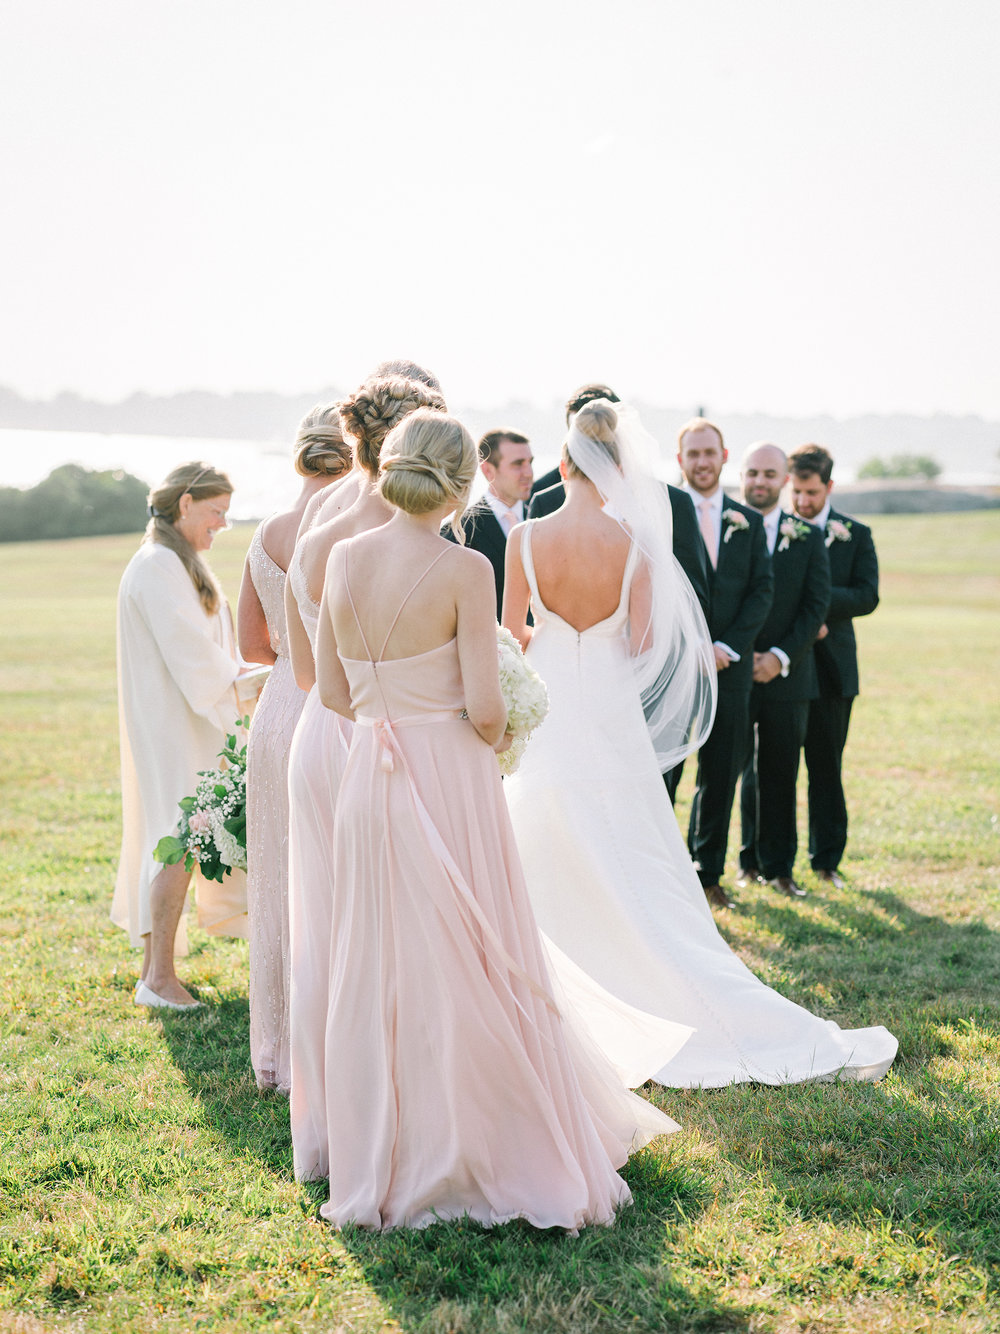 hannah-cochran-photography-bob-and-hayley-wedding-165.jpg